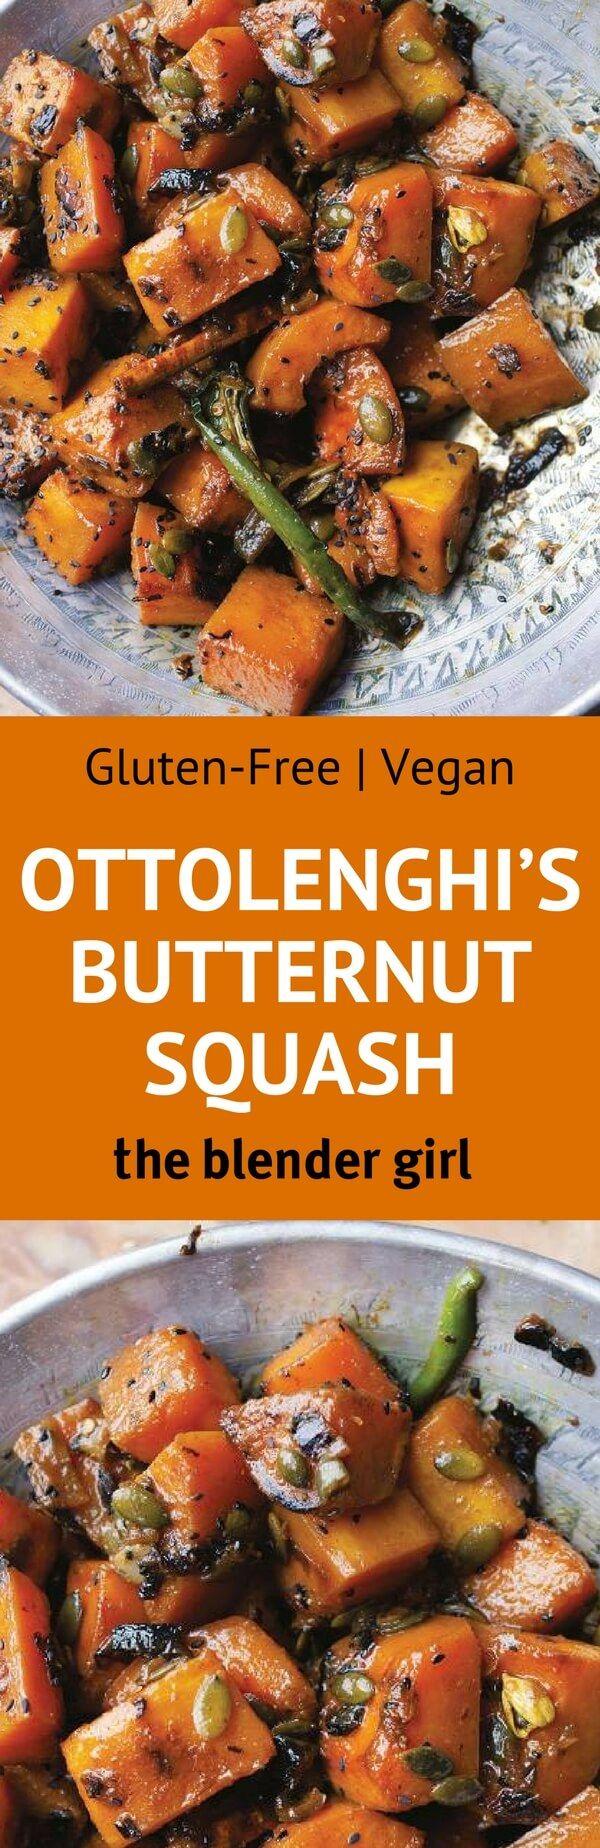 Ottolenghi Recipes | Plenty More Recipes | The Blender Girl #glutenfree #vegan #butternutsquash